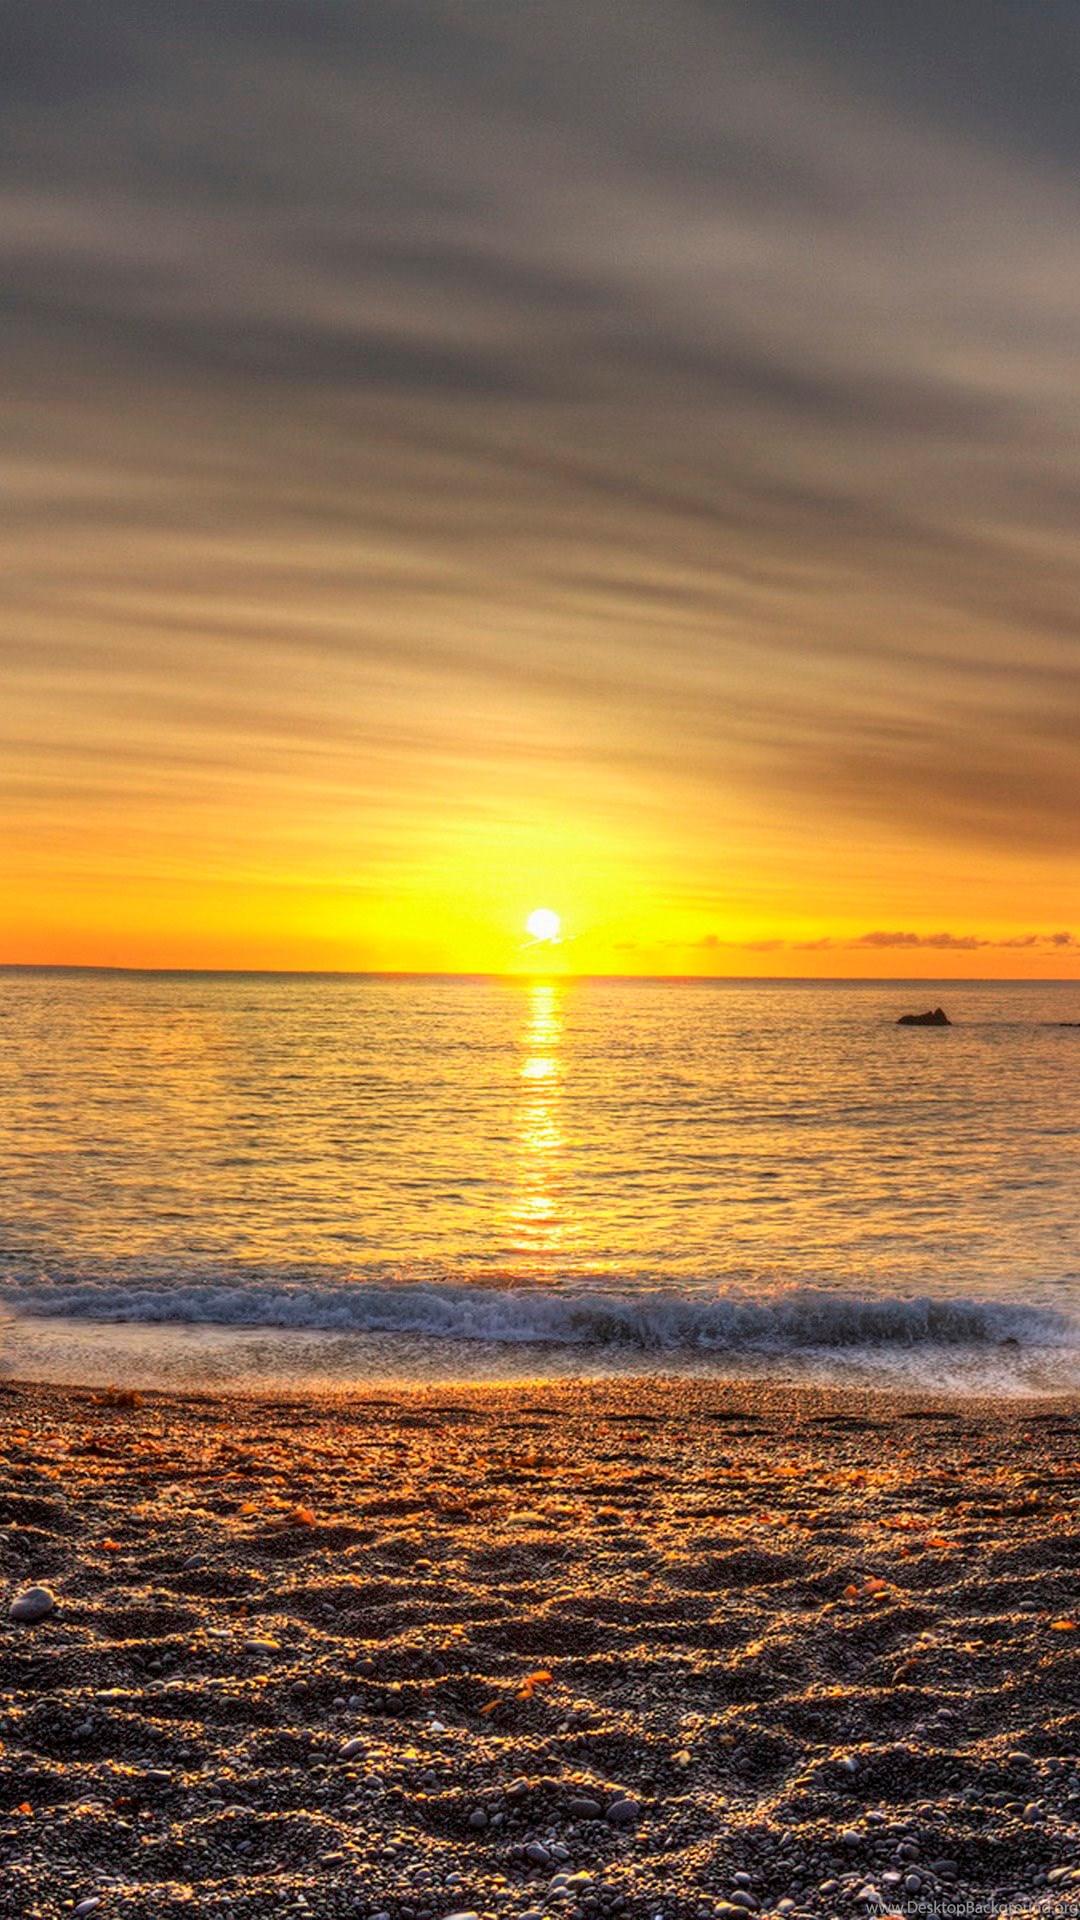 Beautiful Beach Sunset Wallpaper IPhone 6 Plus Wallpapers Desktop